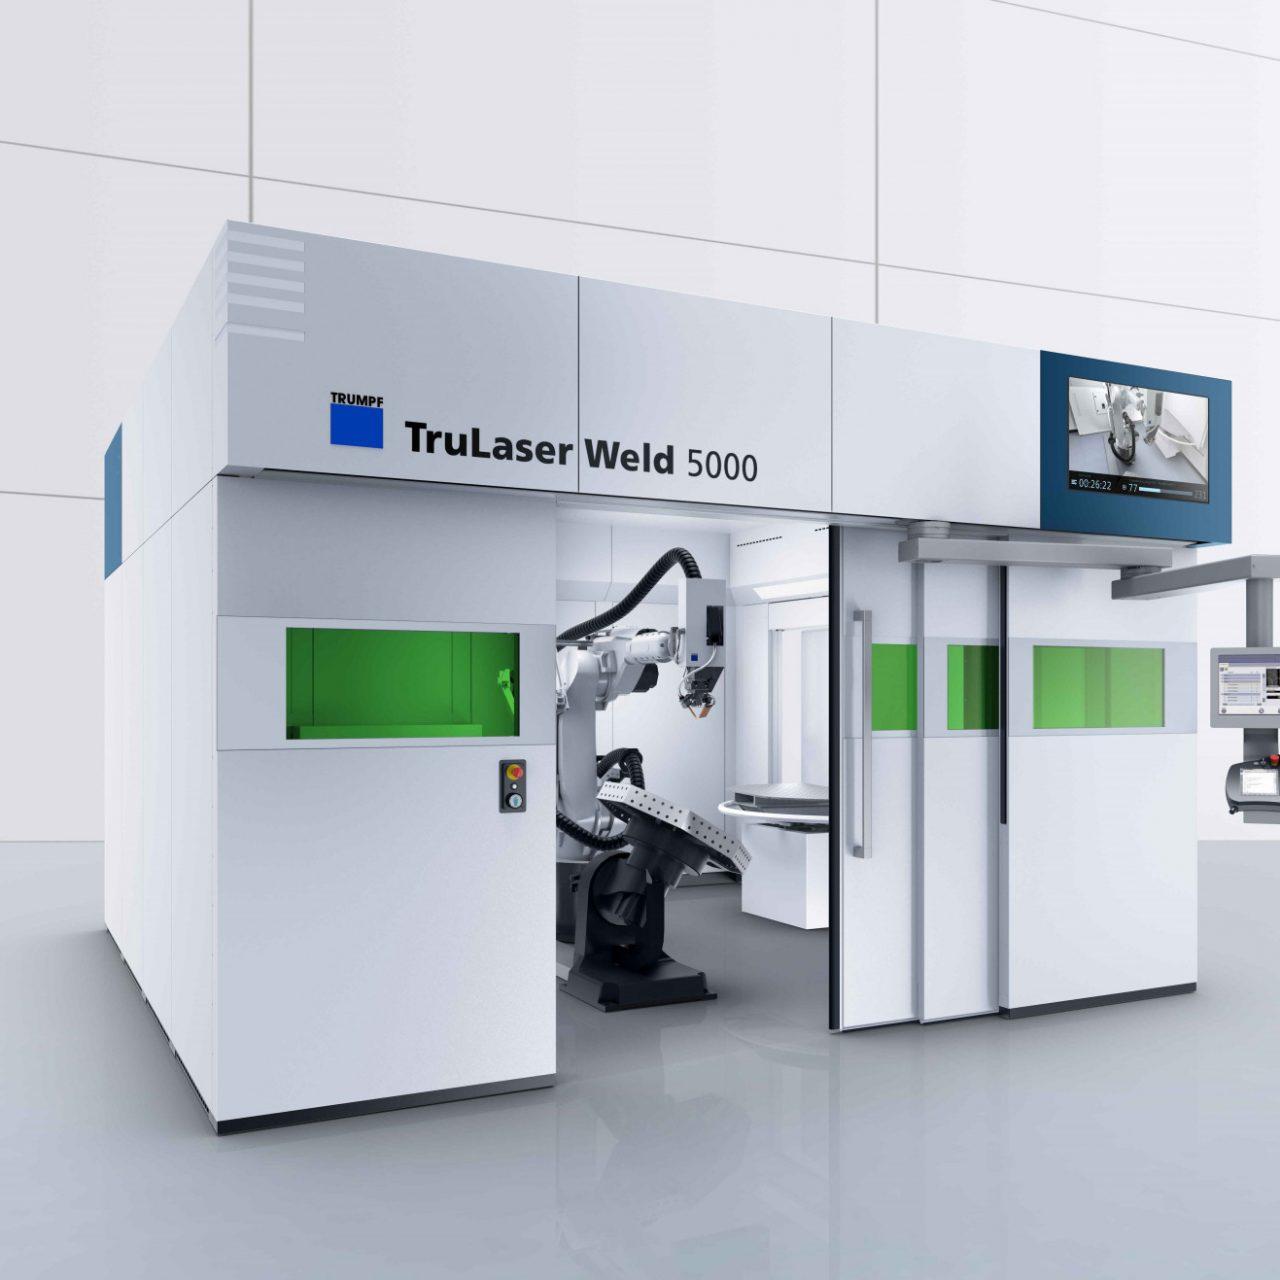 trulaser-weld-5000-carbide-laser welding